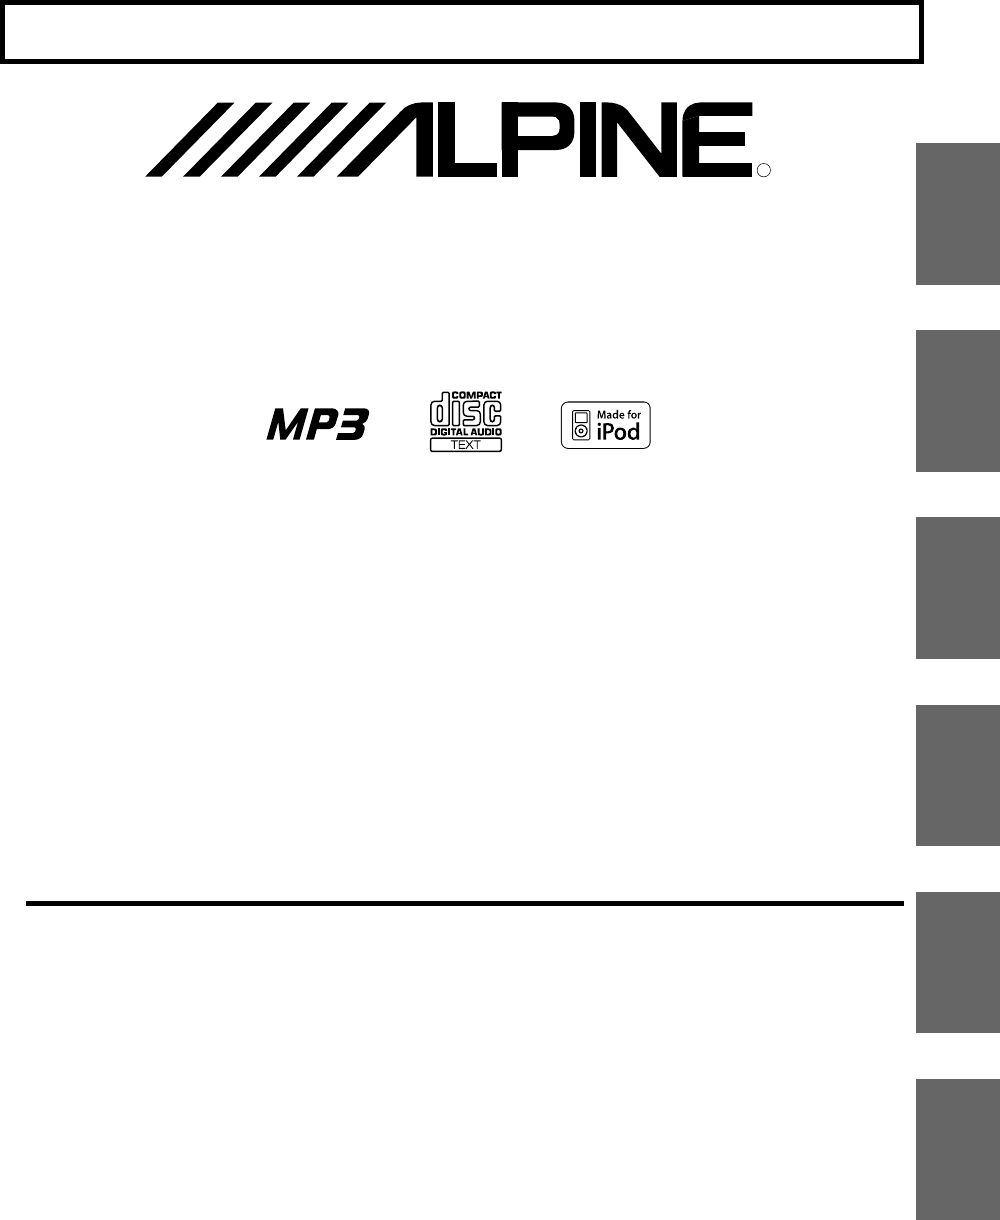 Manual Alpine CDE-9870R (page 1 of 36) (English)